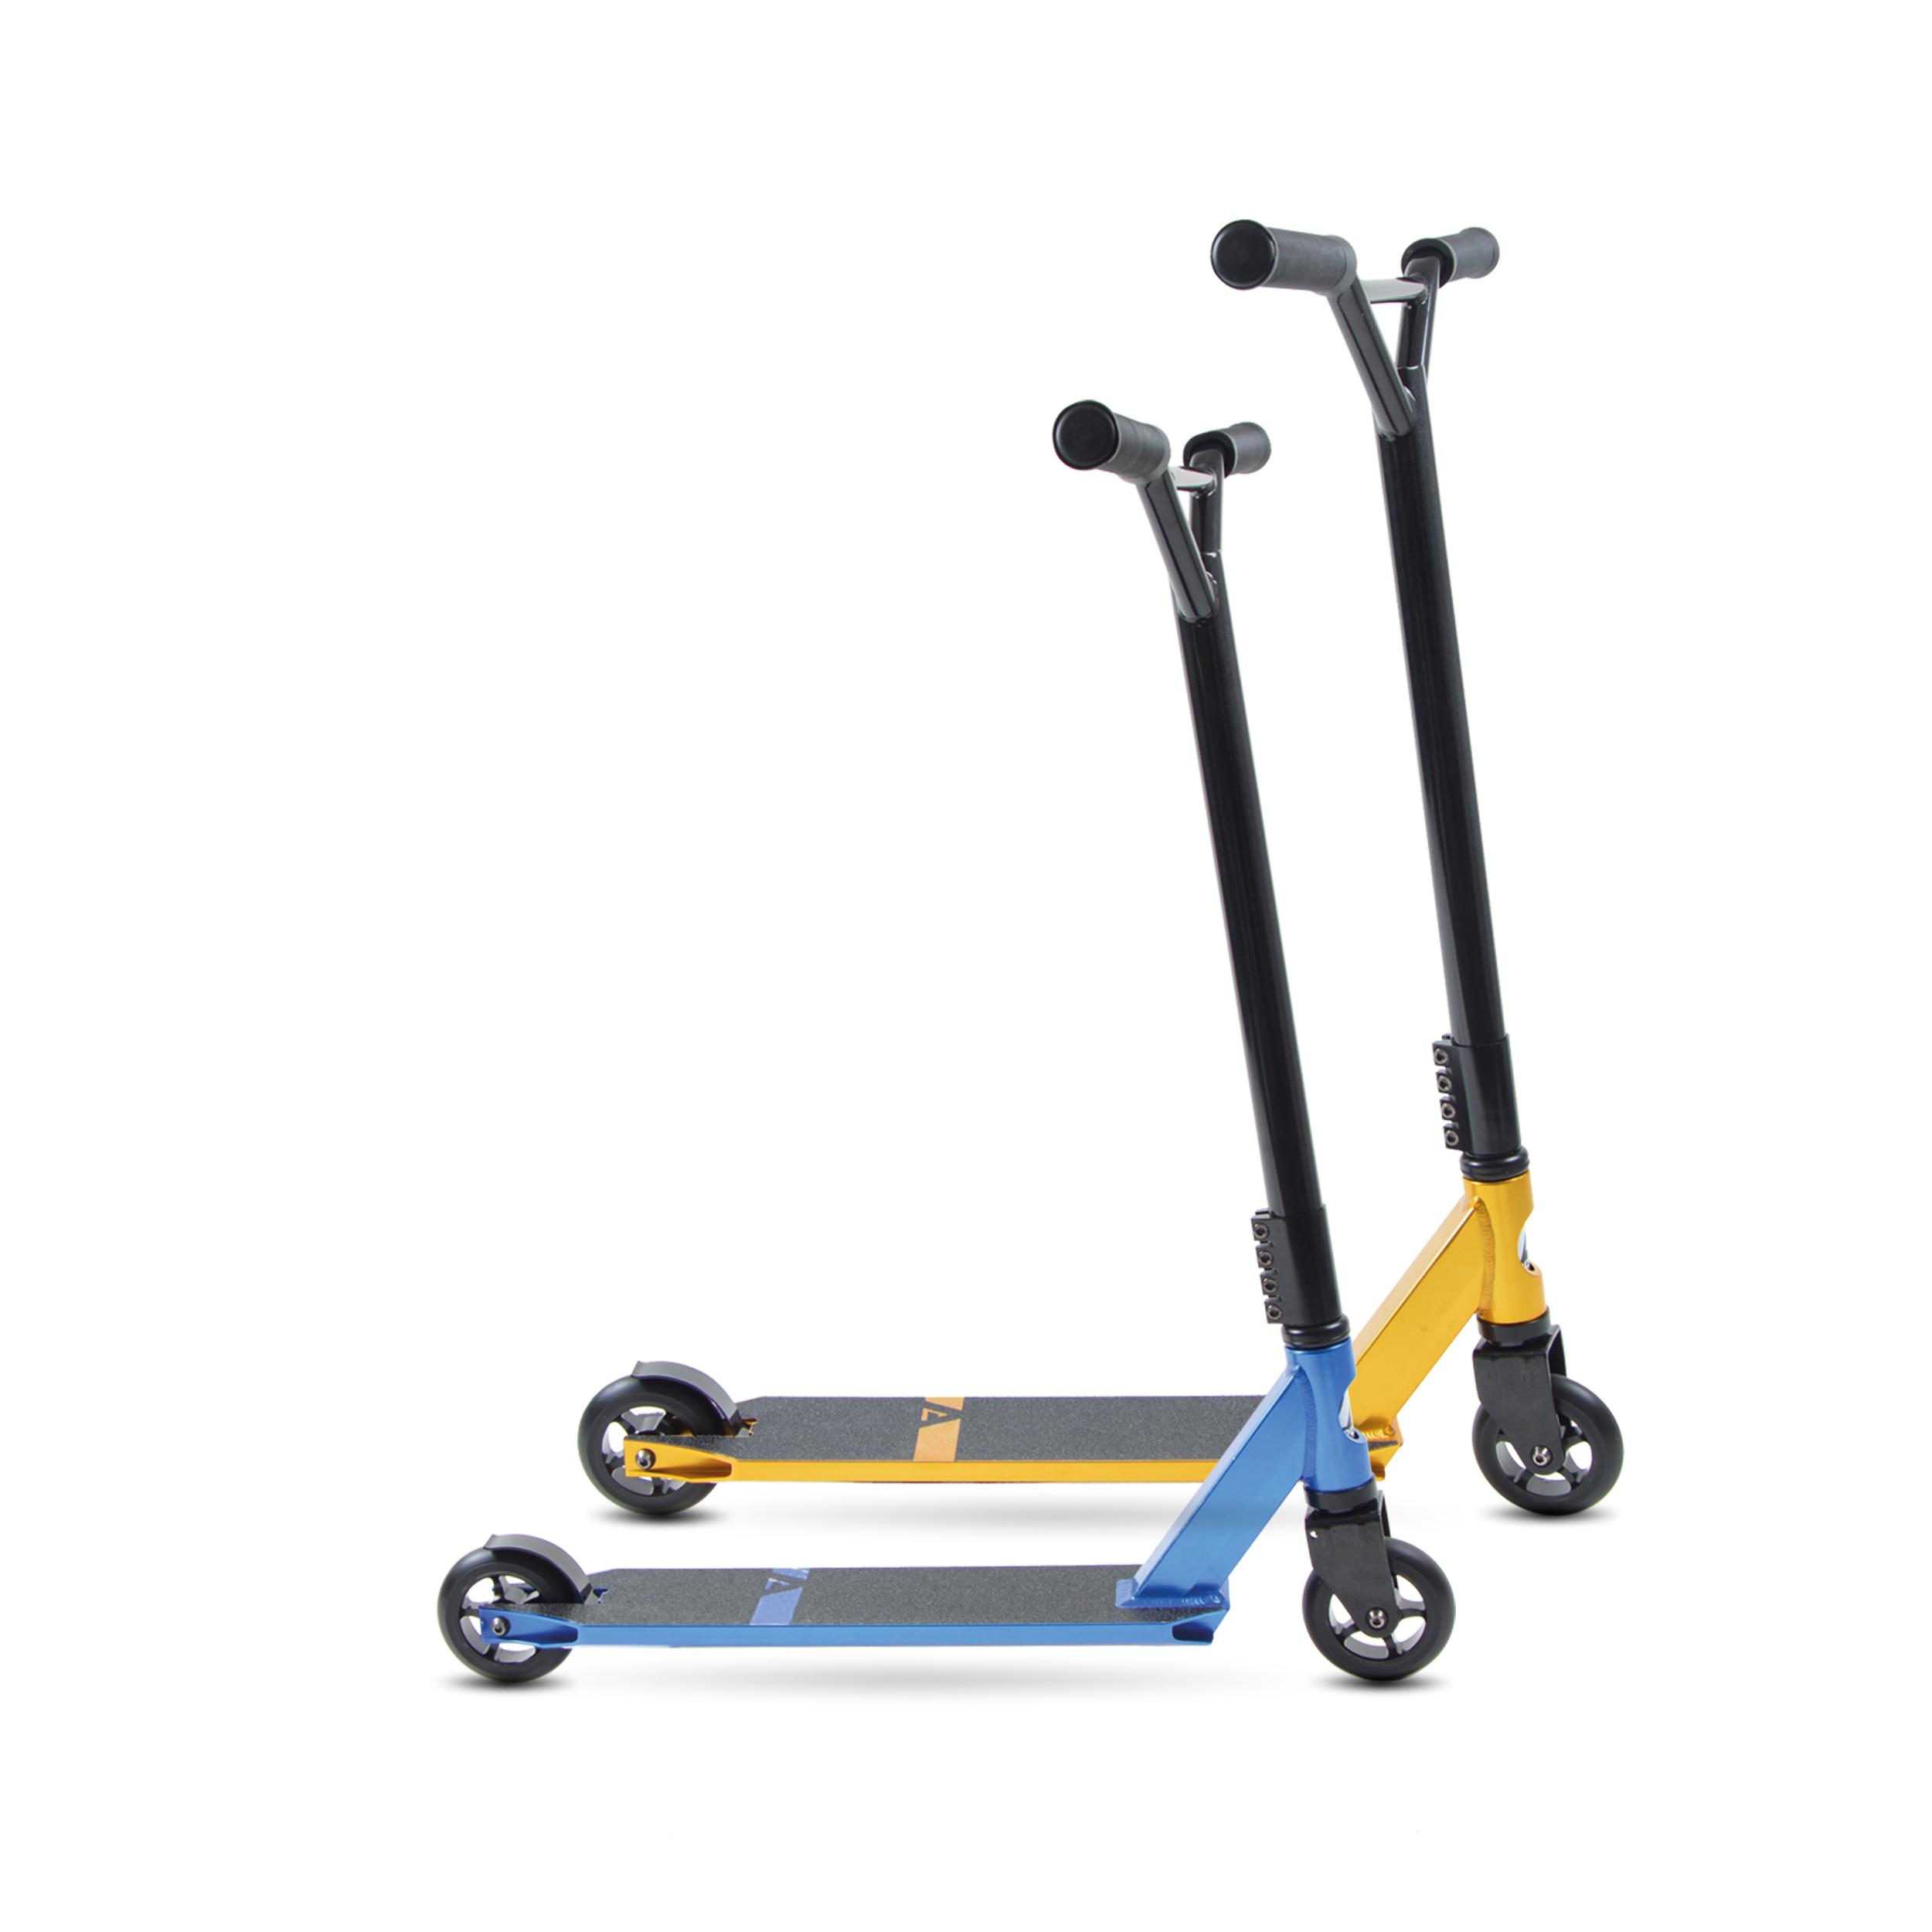 apollo stunt scooter kickscooter mit abec 9 kugellager. Black Bedroom Furniture Sets. Home Design Ideas